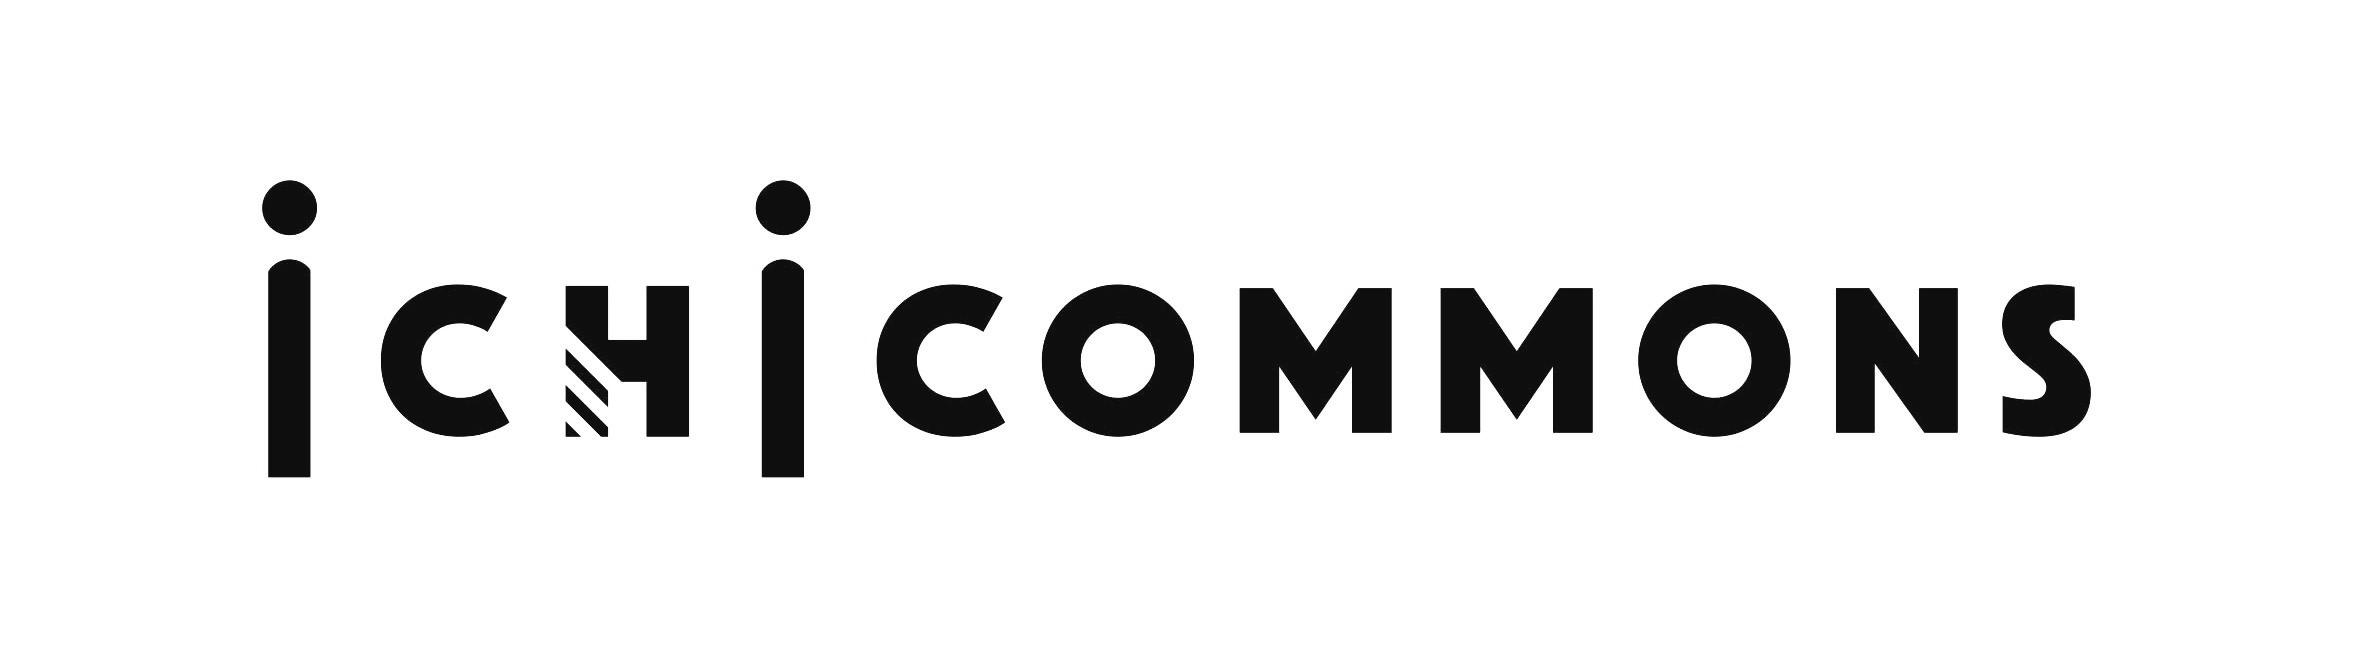 ICHI COMMONS株式会社